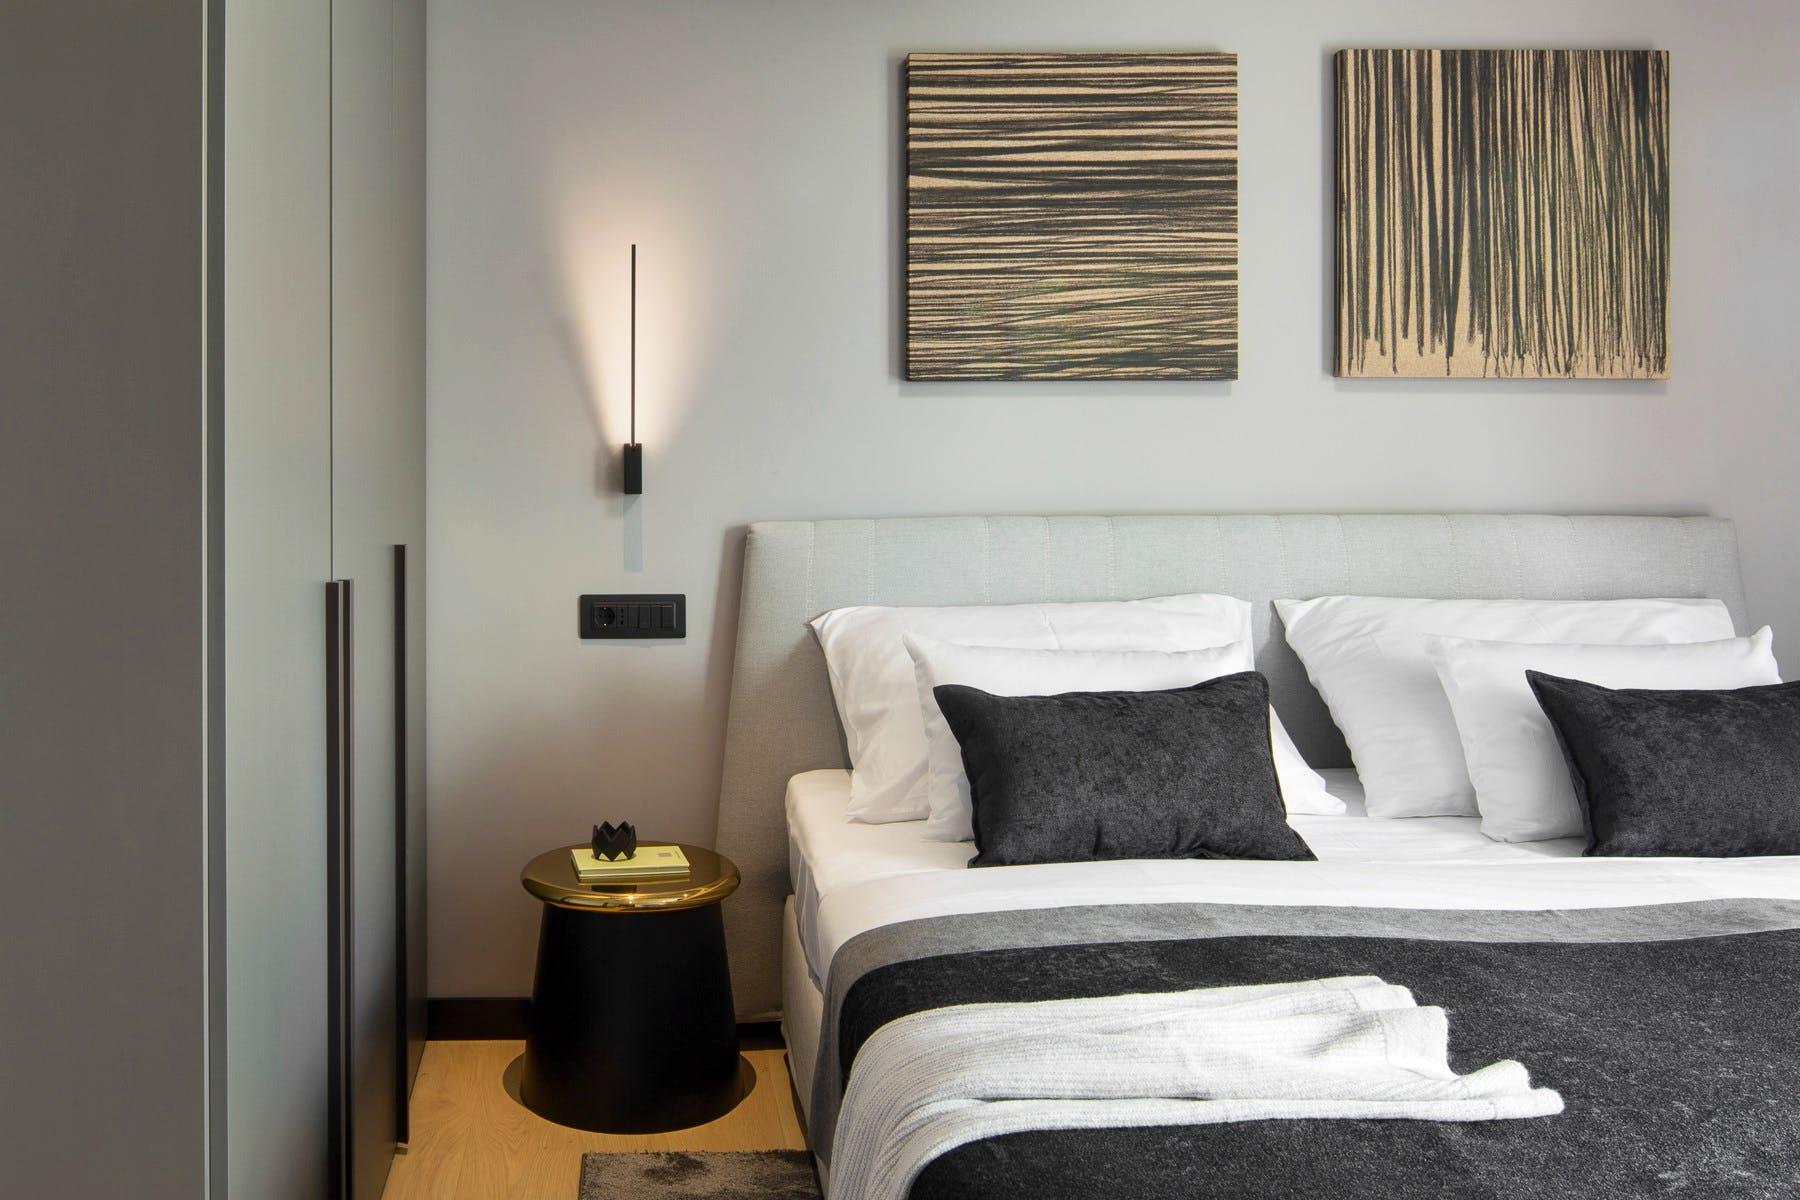 Stylish bedroom with modern amenities